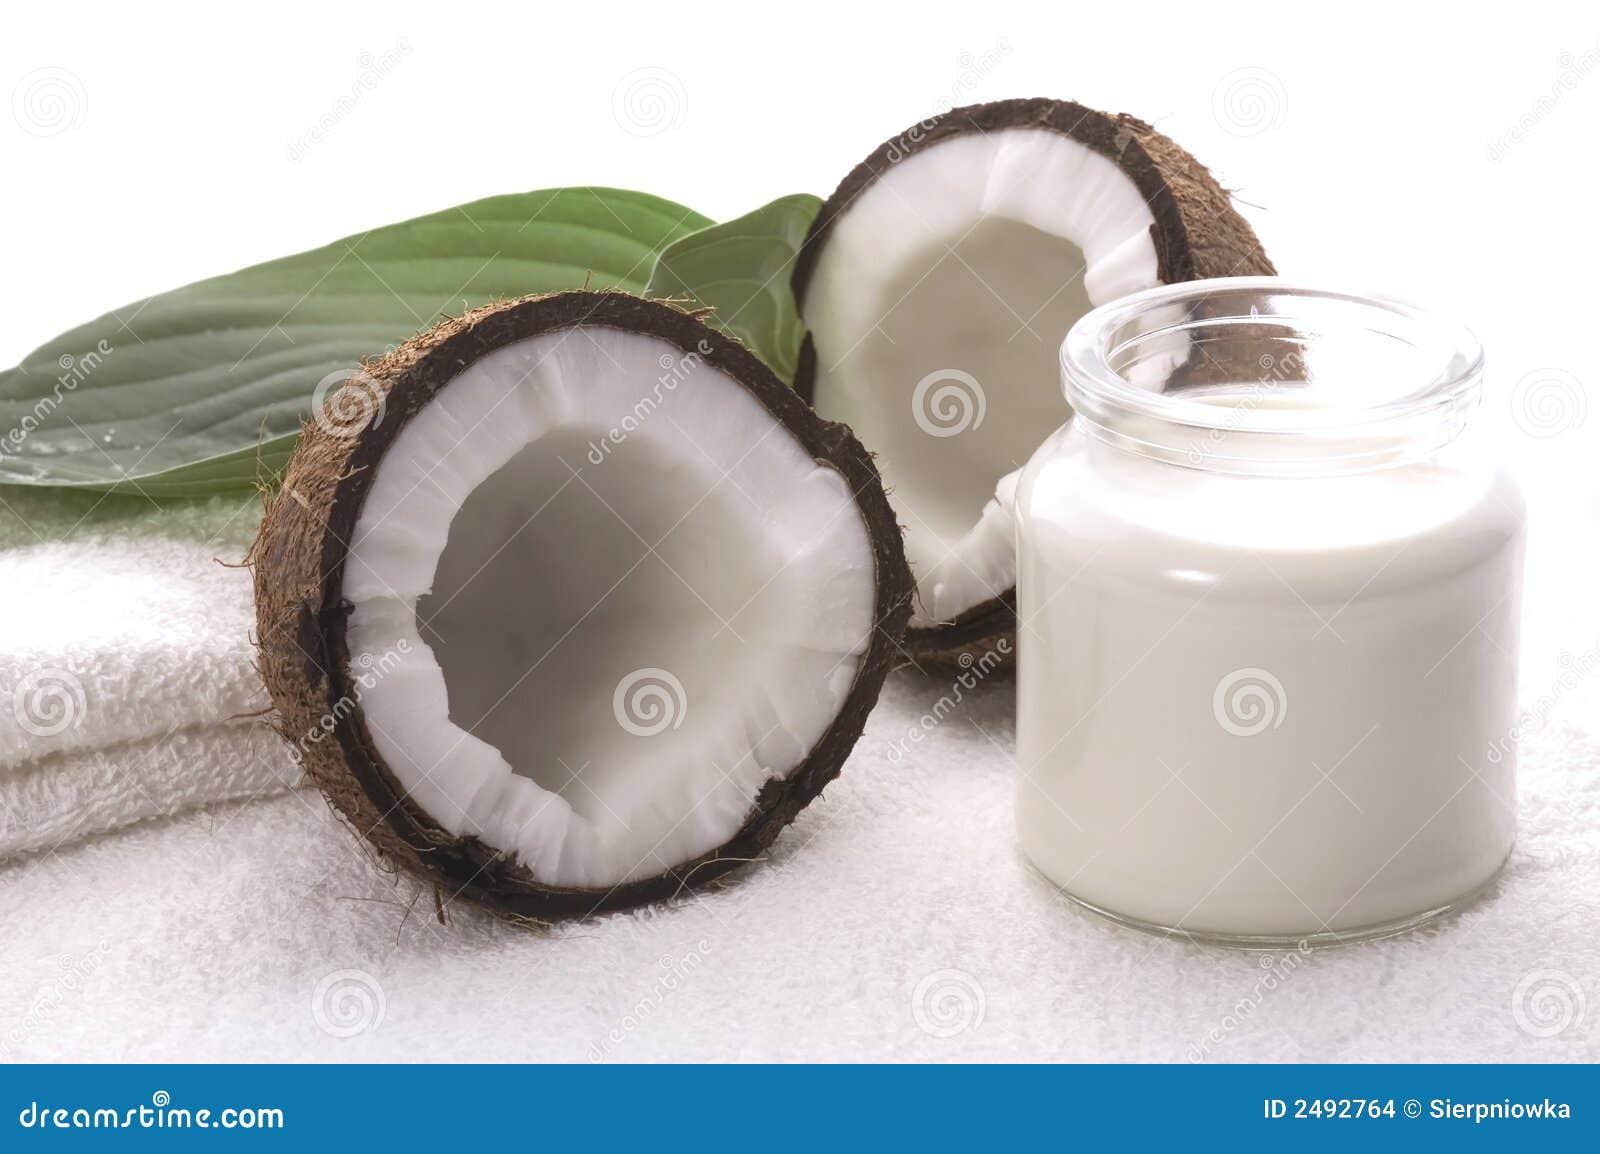 Coco bath items